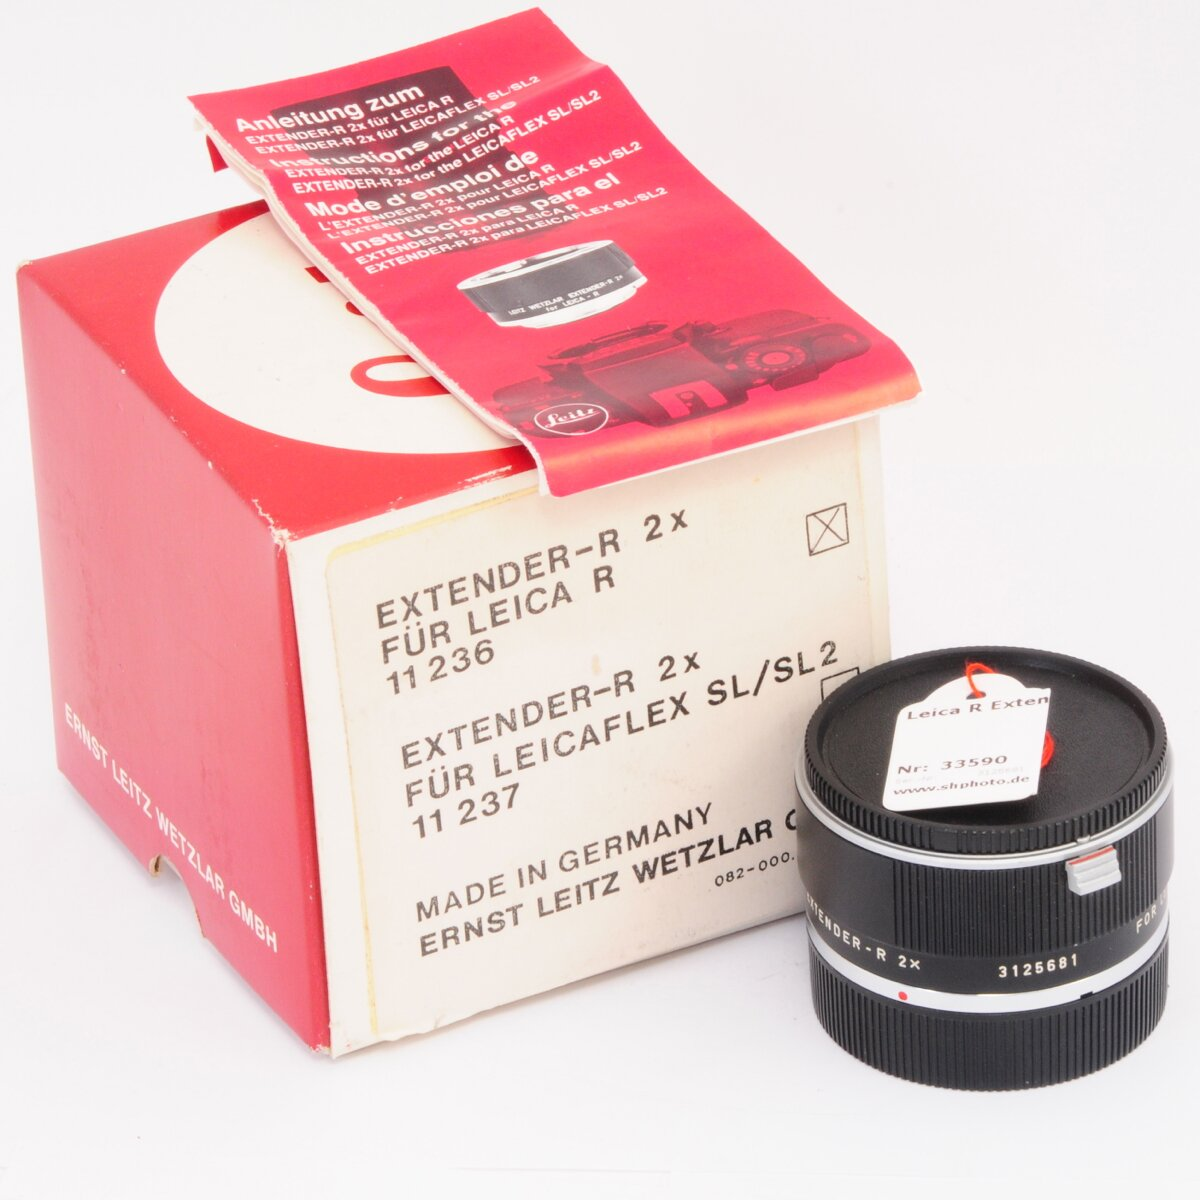 Leica R Extender 2x